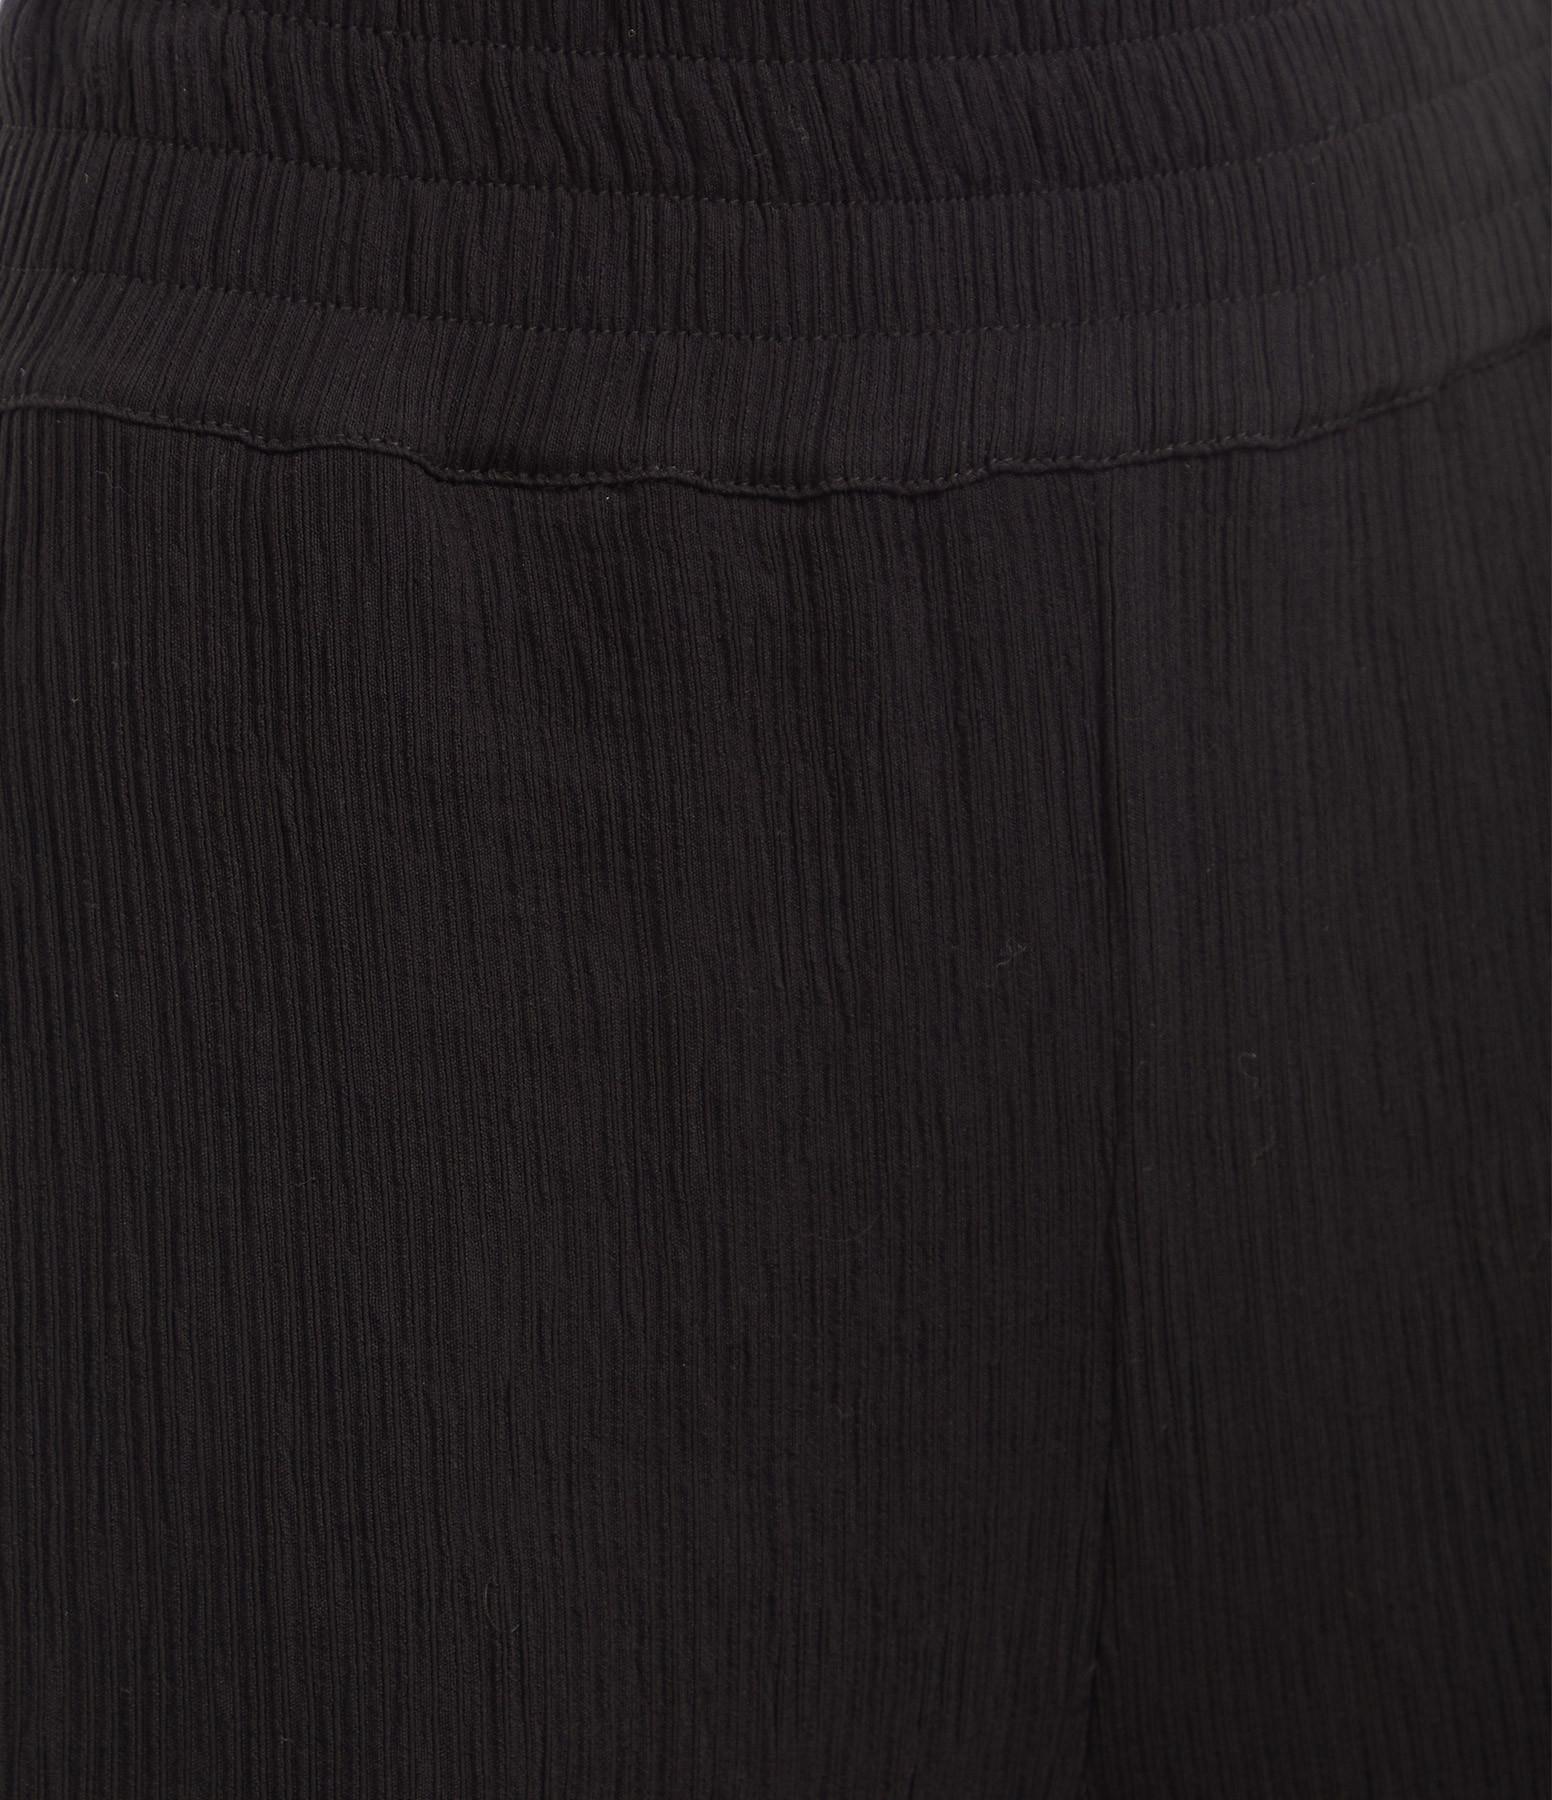 MARGAUX LONNBERG - Pantalon Wilson Noir